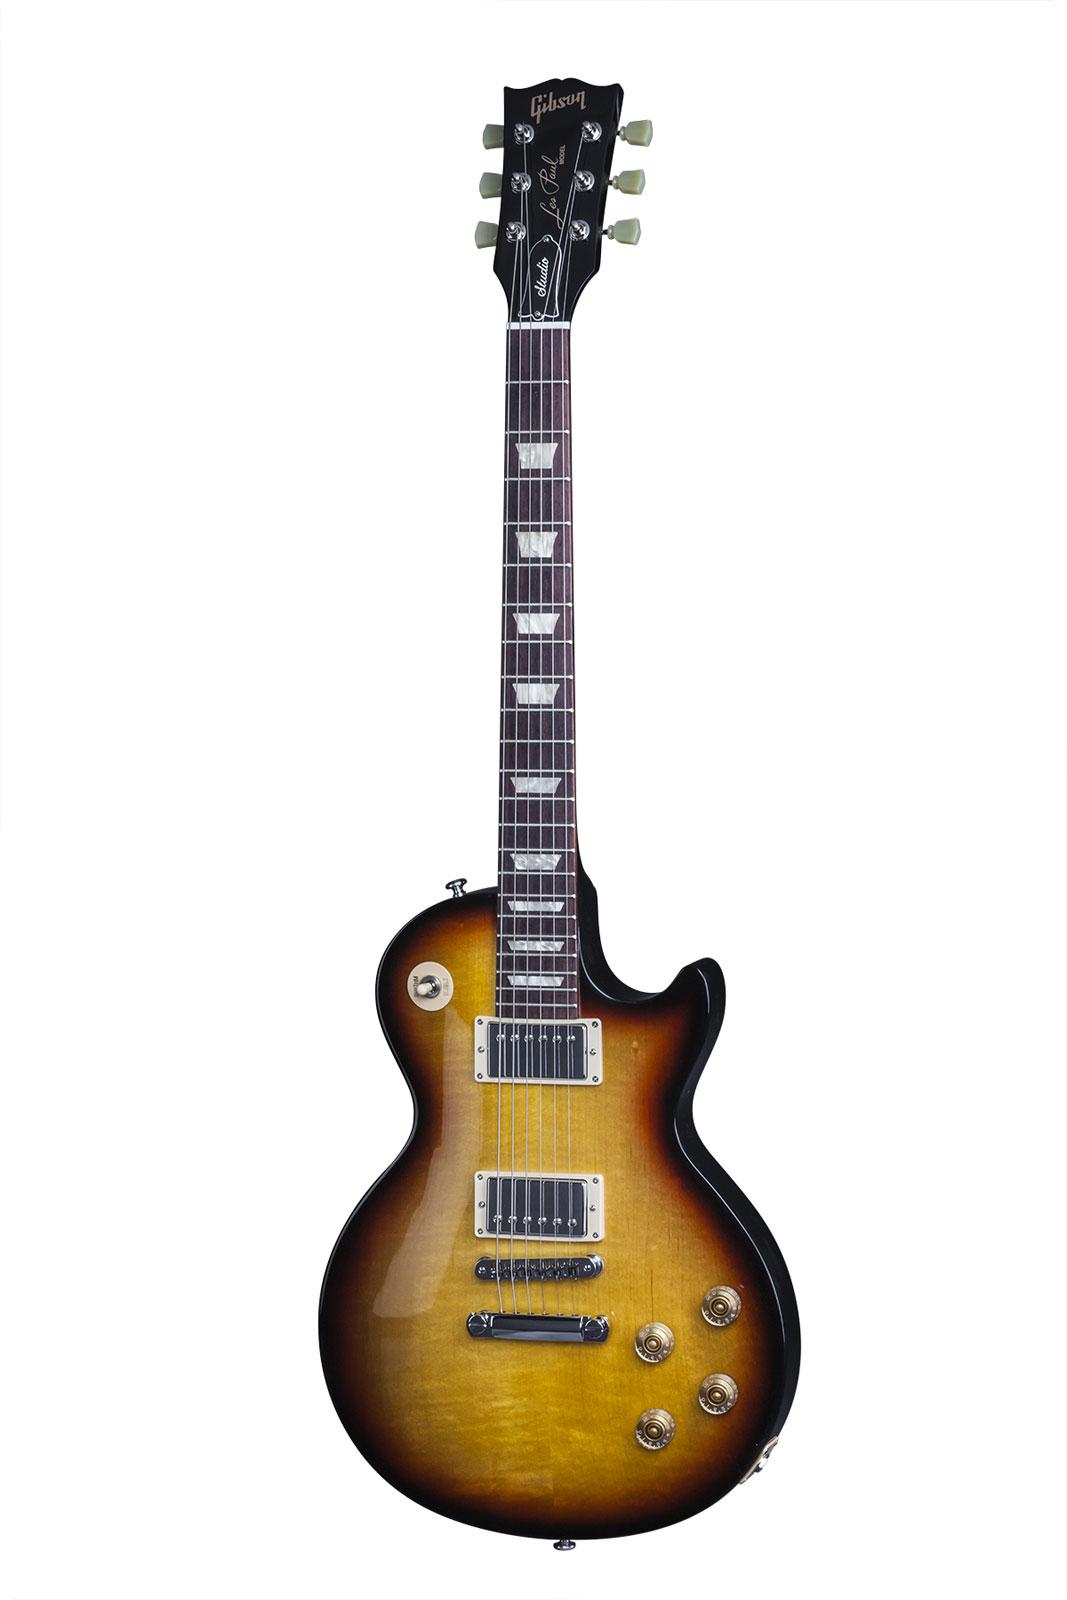 gibson usa les paul standard guitare lectrique honey. Black Bedroom Furniture Sets. Home Design Ideas